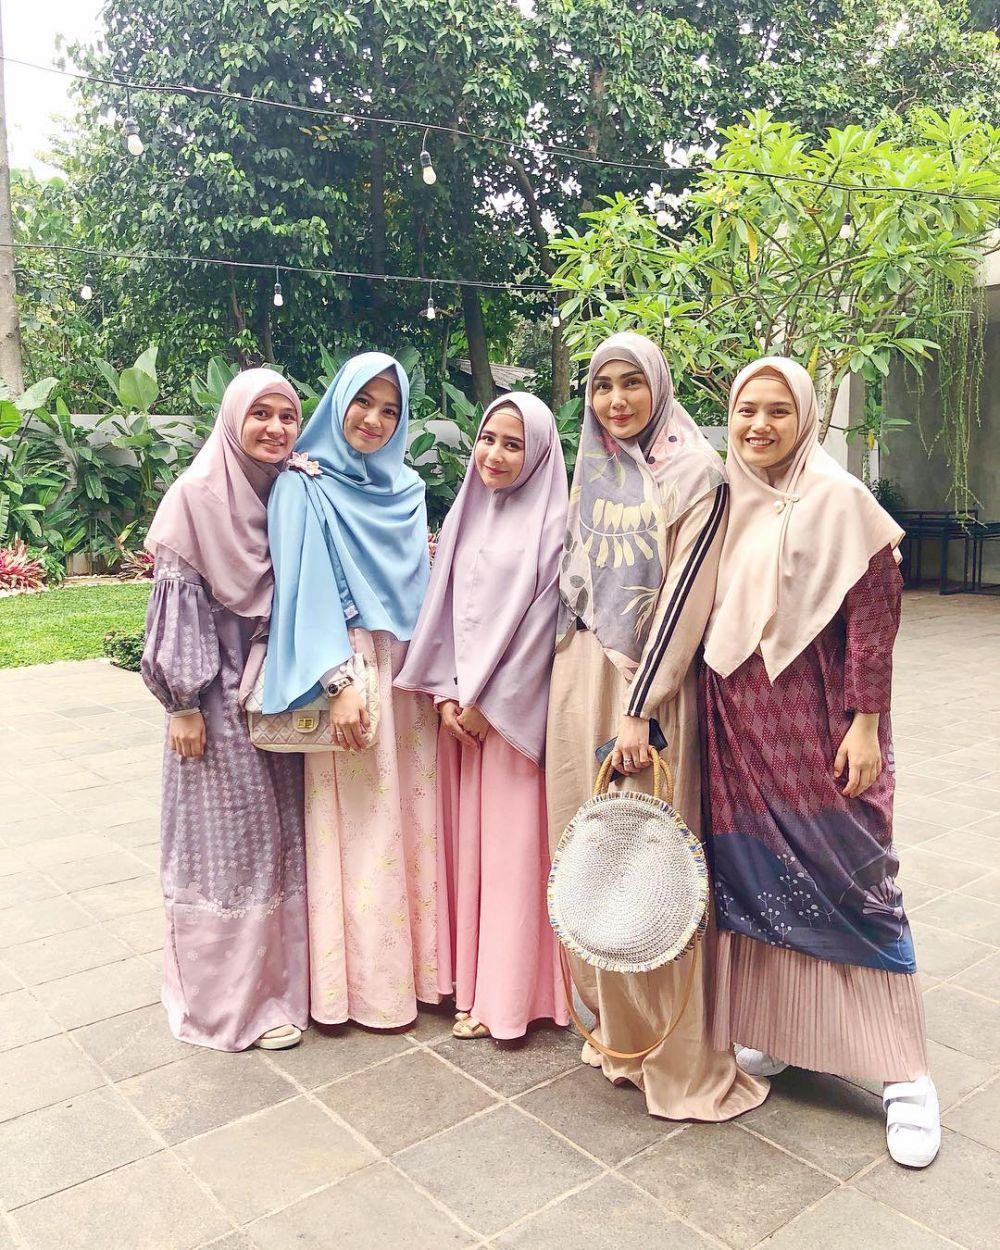 Prilly hijab syar'i © 2018 Instagram